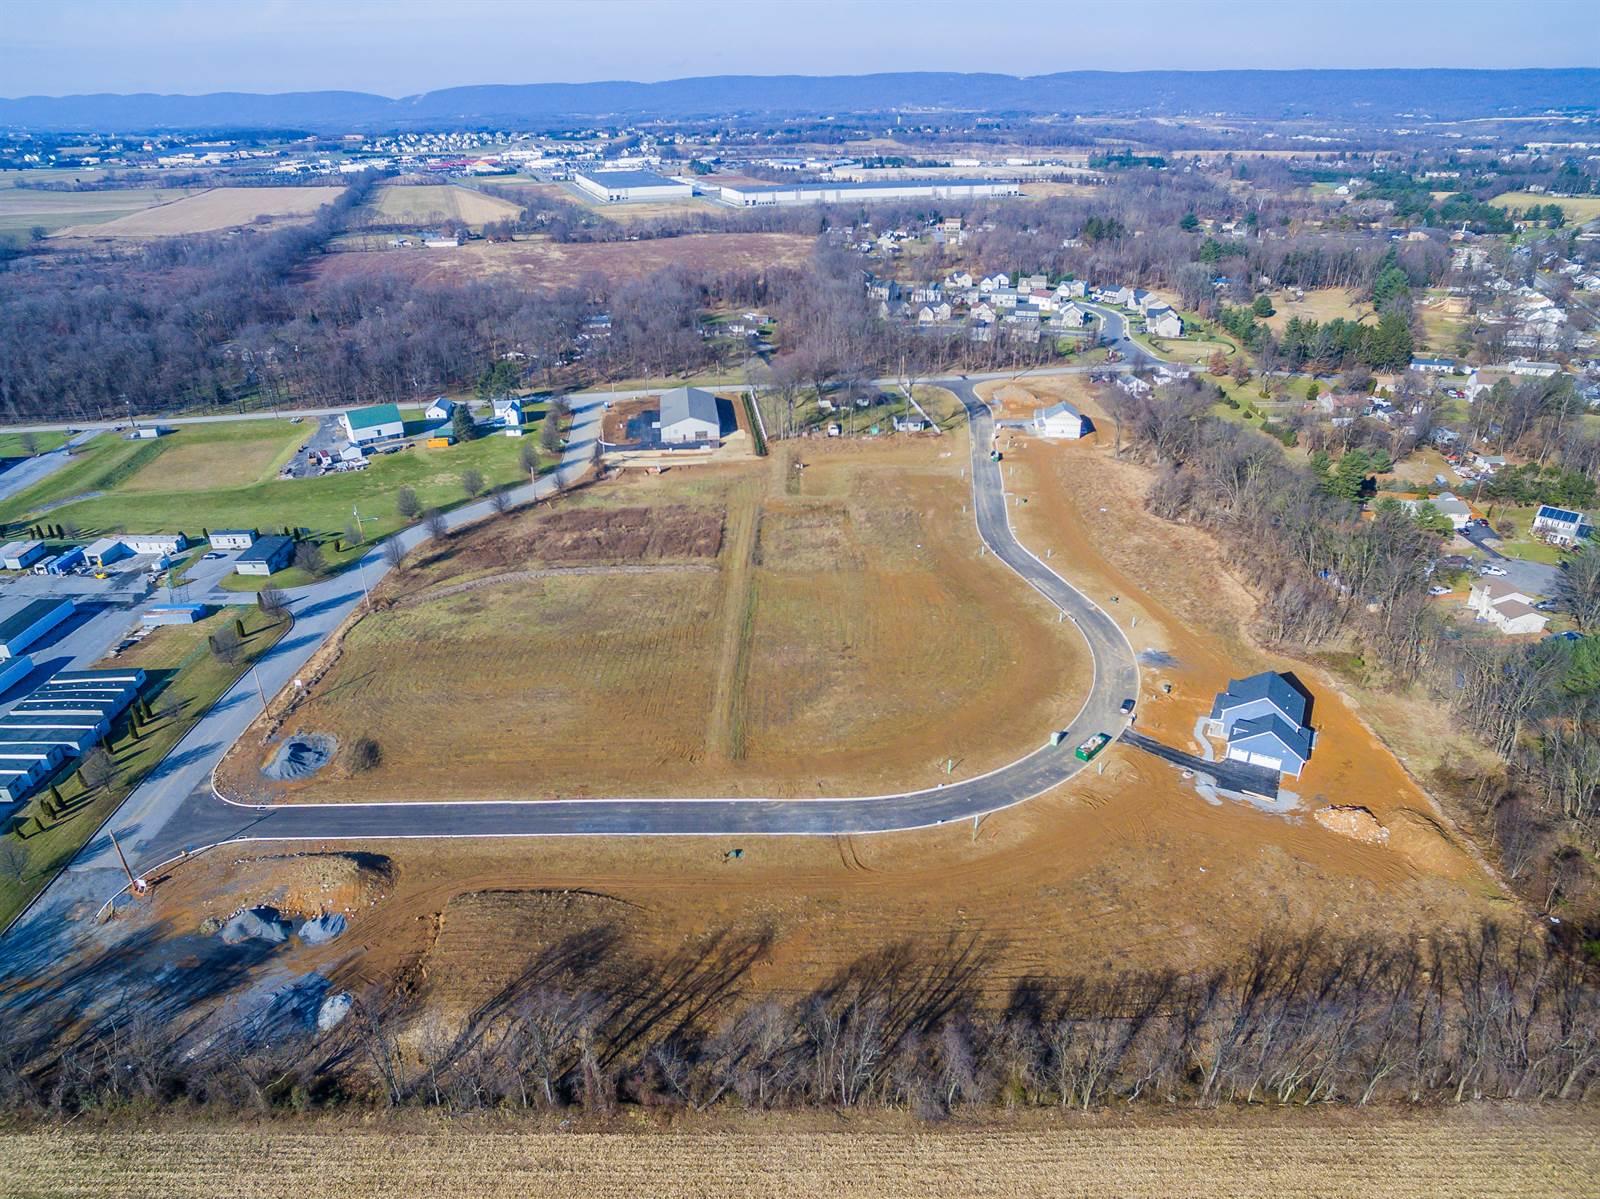 Lot 27 Westhaven, Mechanicsburg, PA 17050